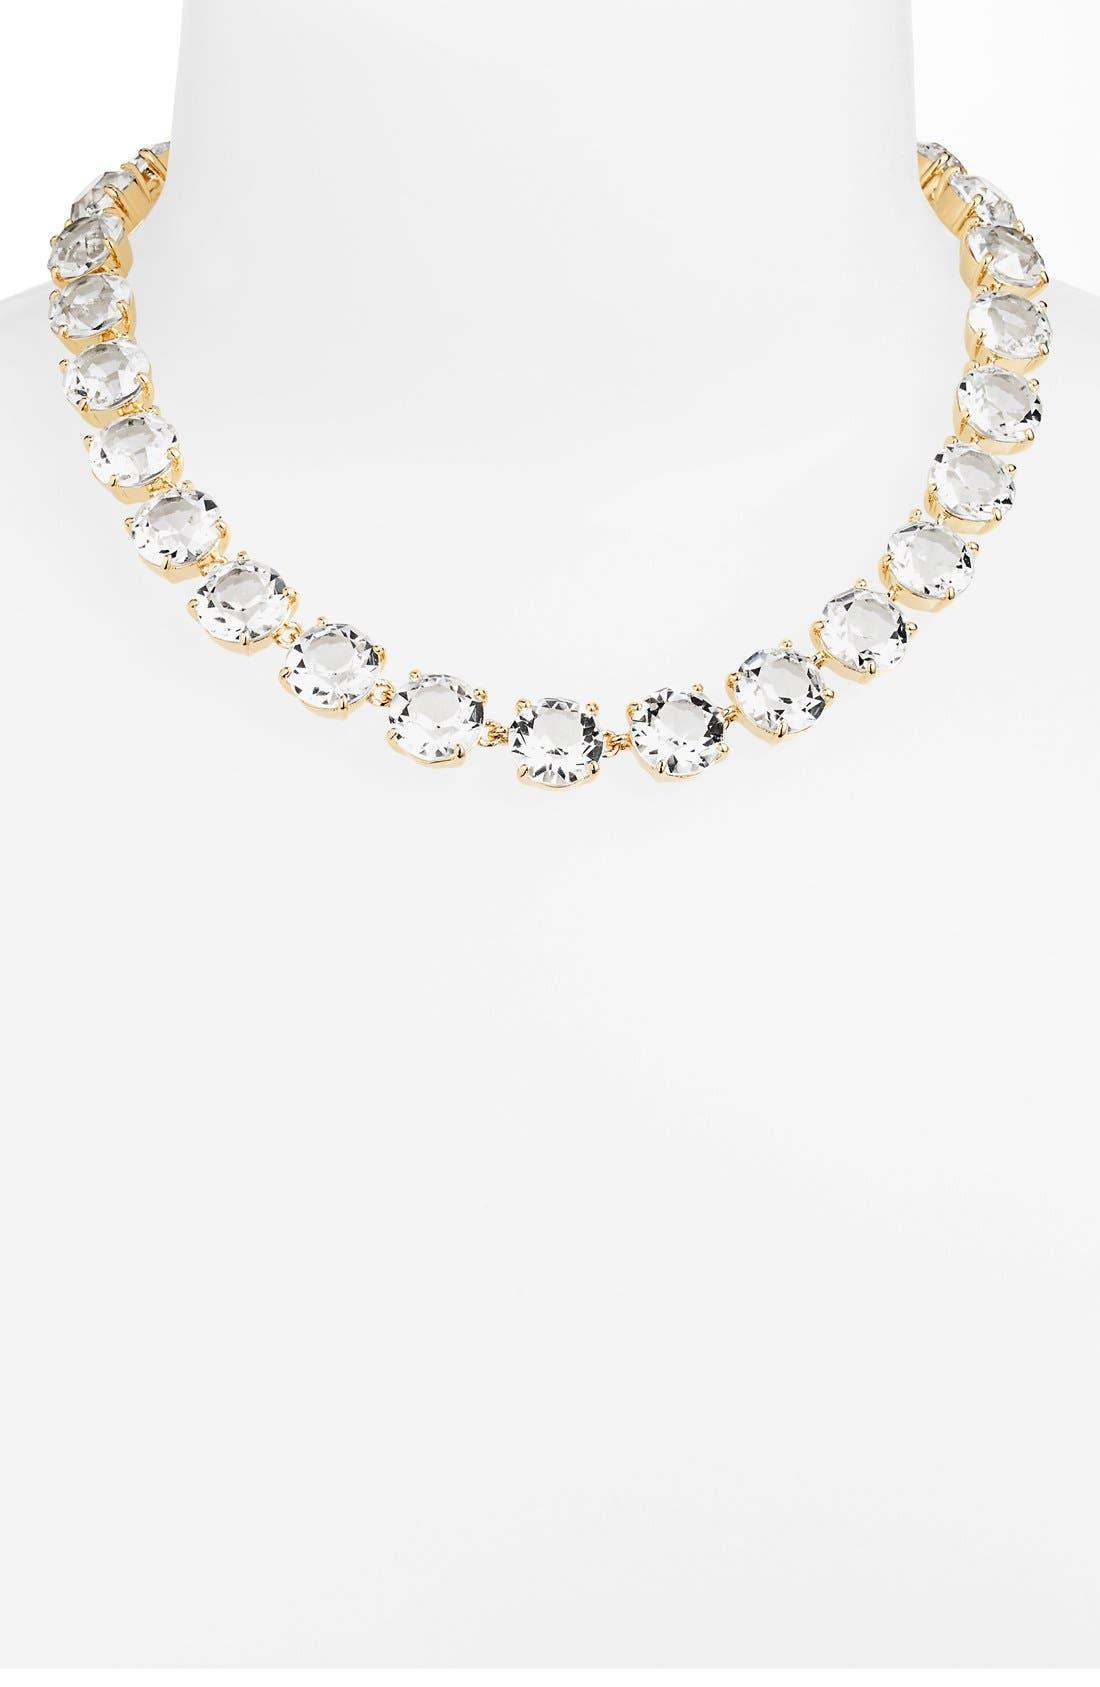 Main Image - Lauren Ralph Lauren 'Signature Collection' Crystal Collar Necklace